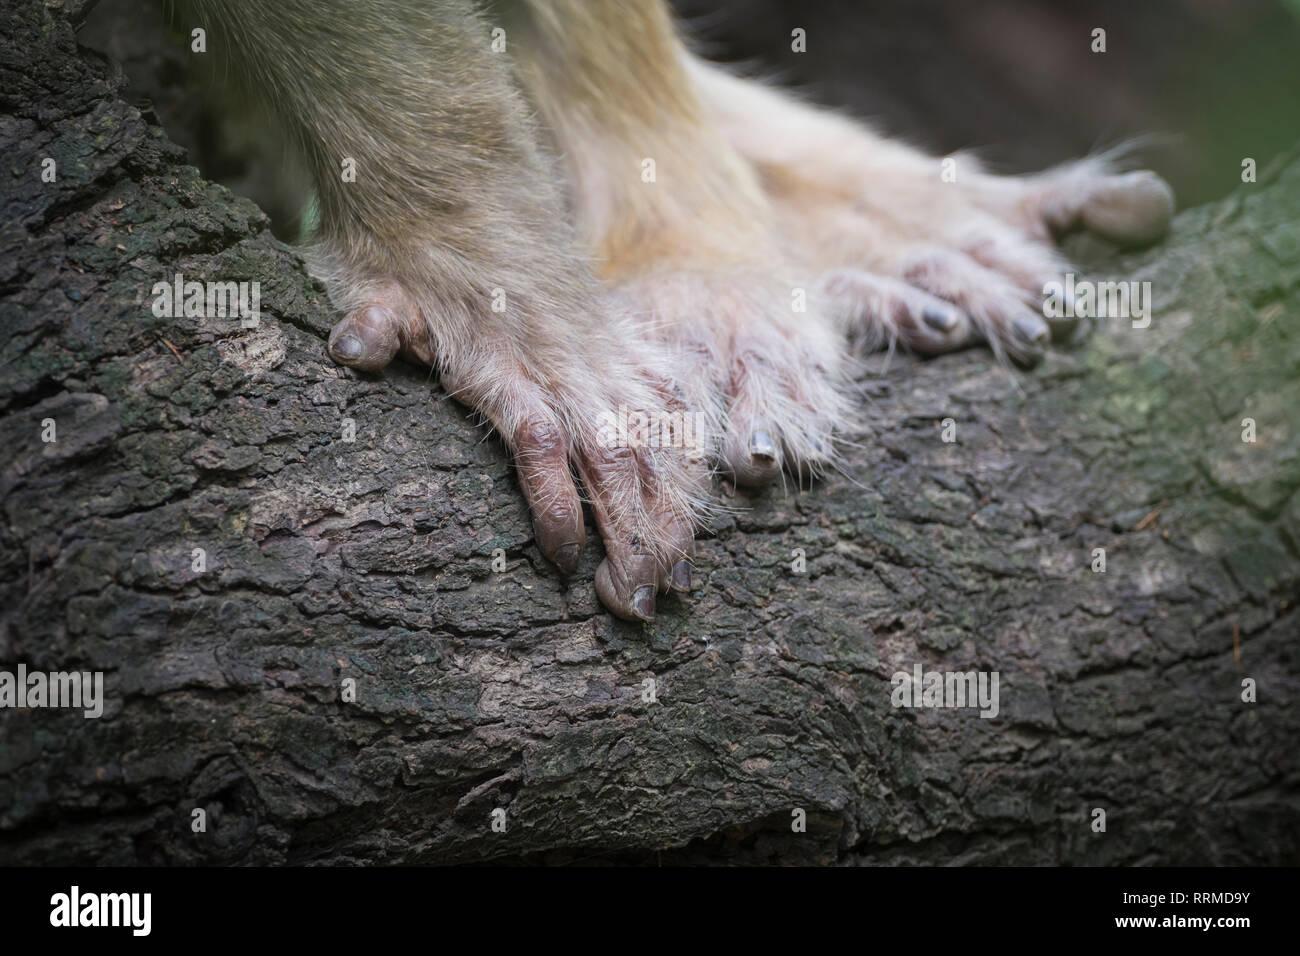 Hands of Rhesus Monkey (Macaca mulatta). Keoladeo National Park. Bharatpur. Rajasthan. India. Stock Photo